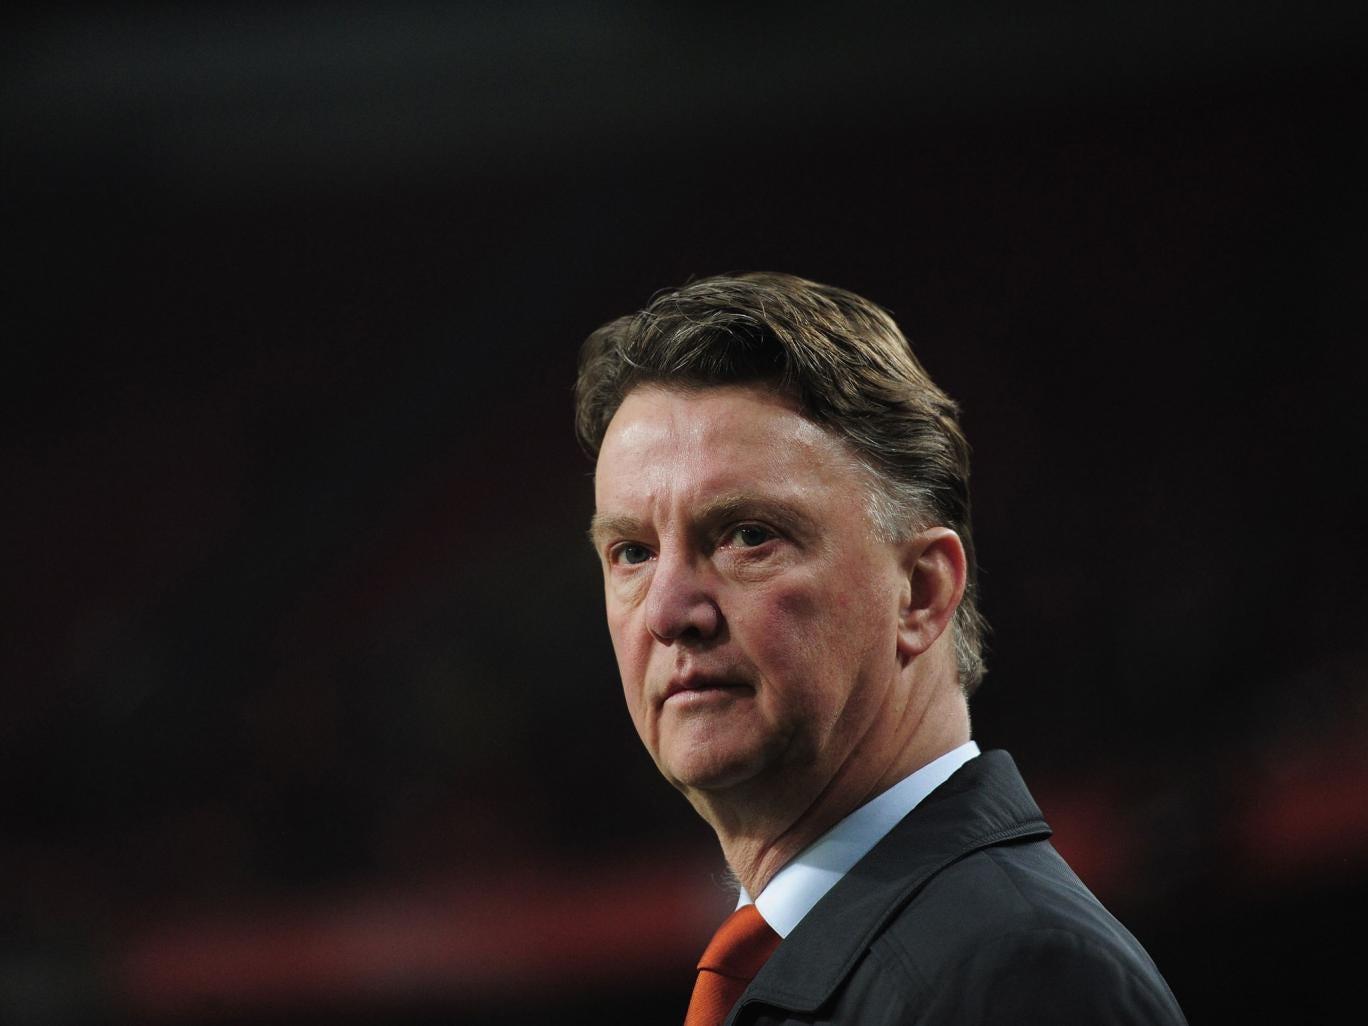 Louis van Gaal is set to become United's boss